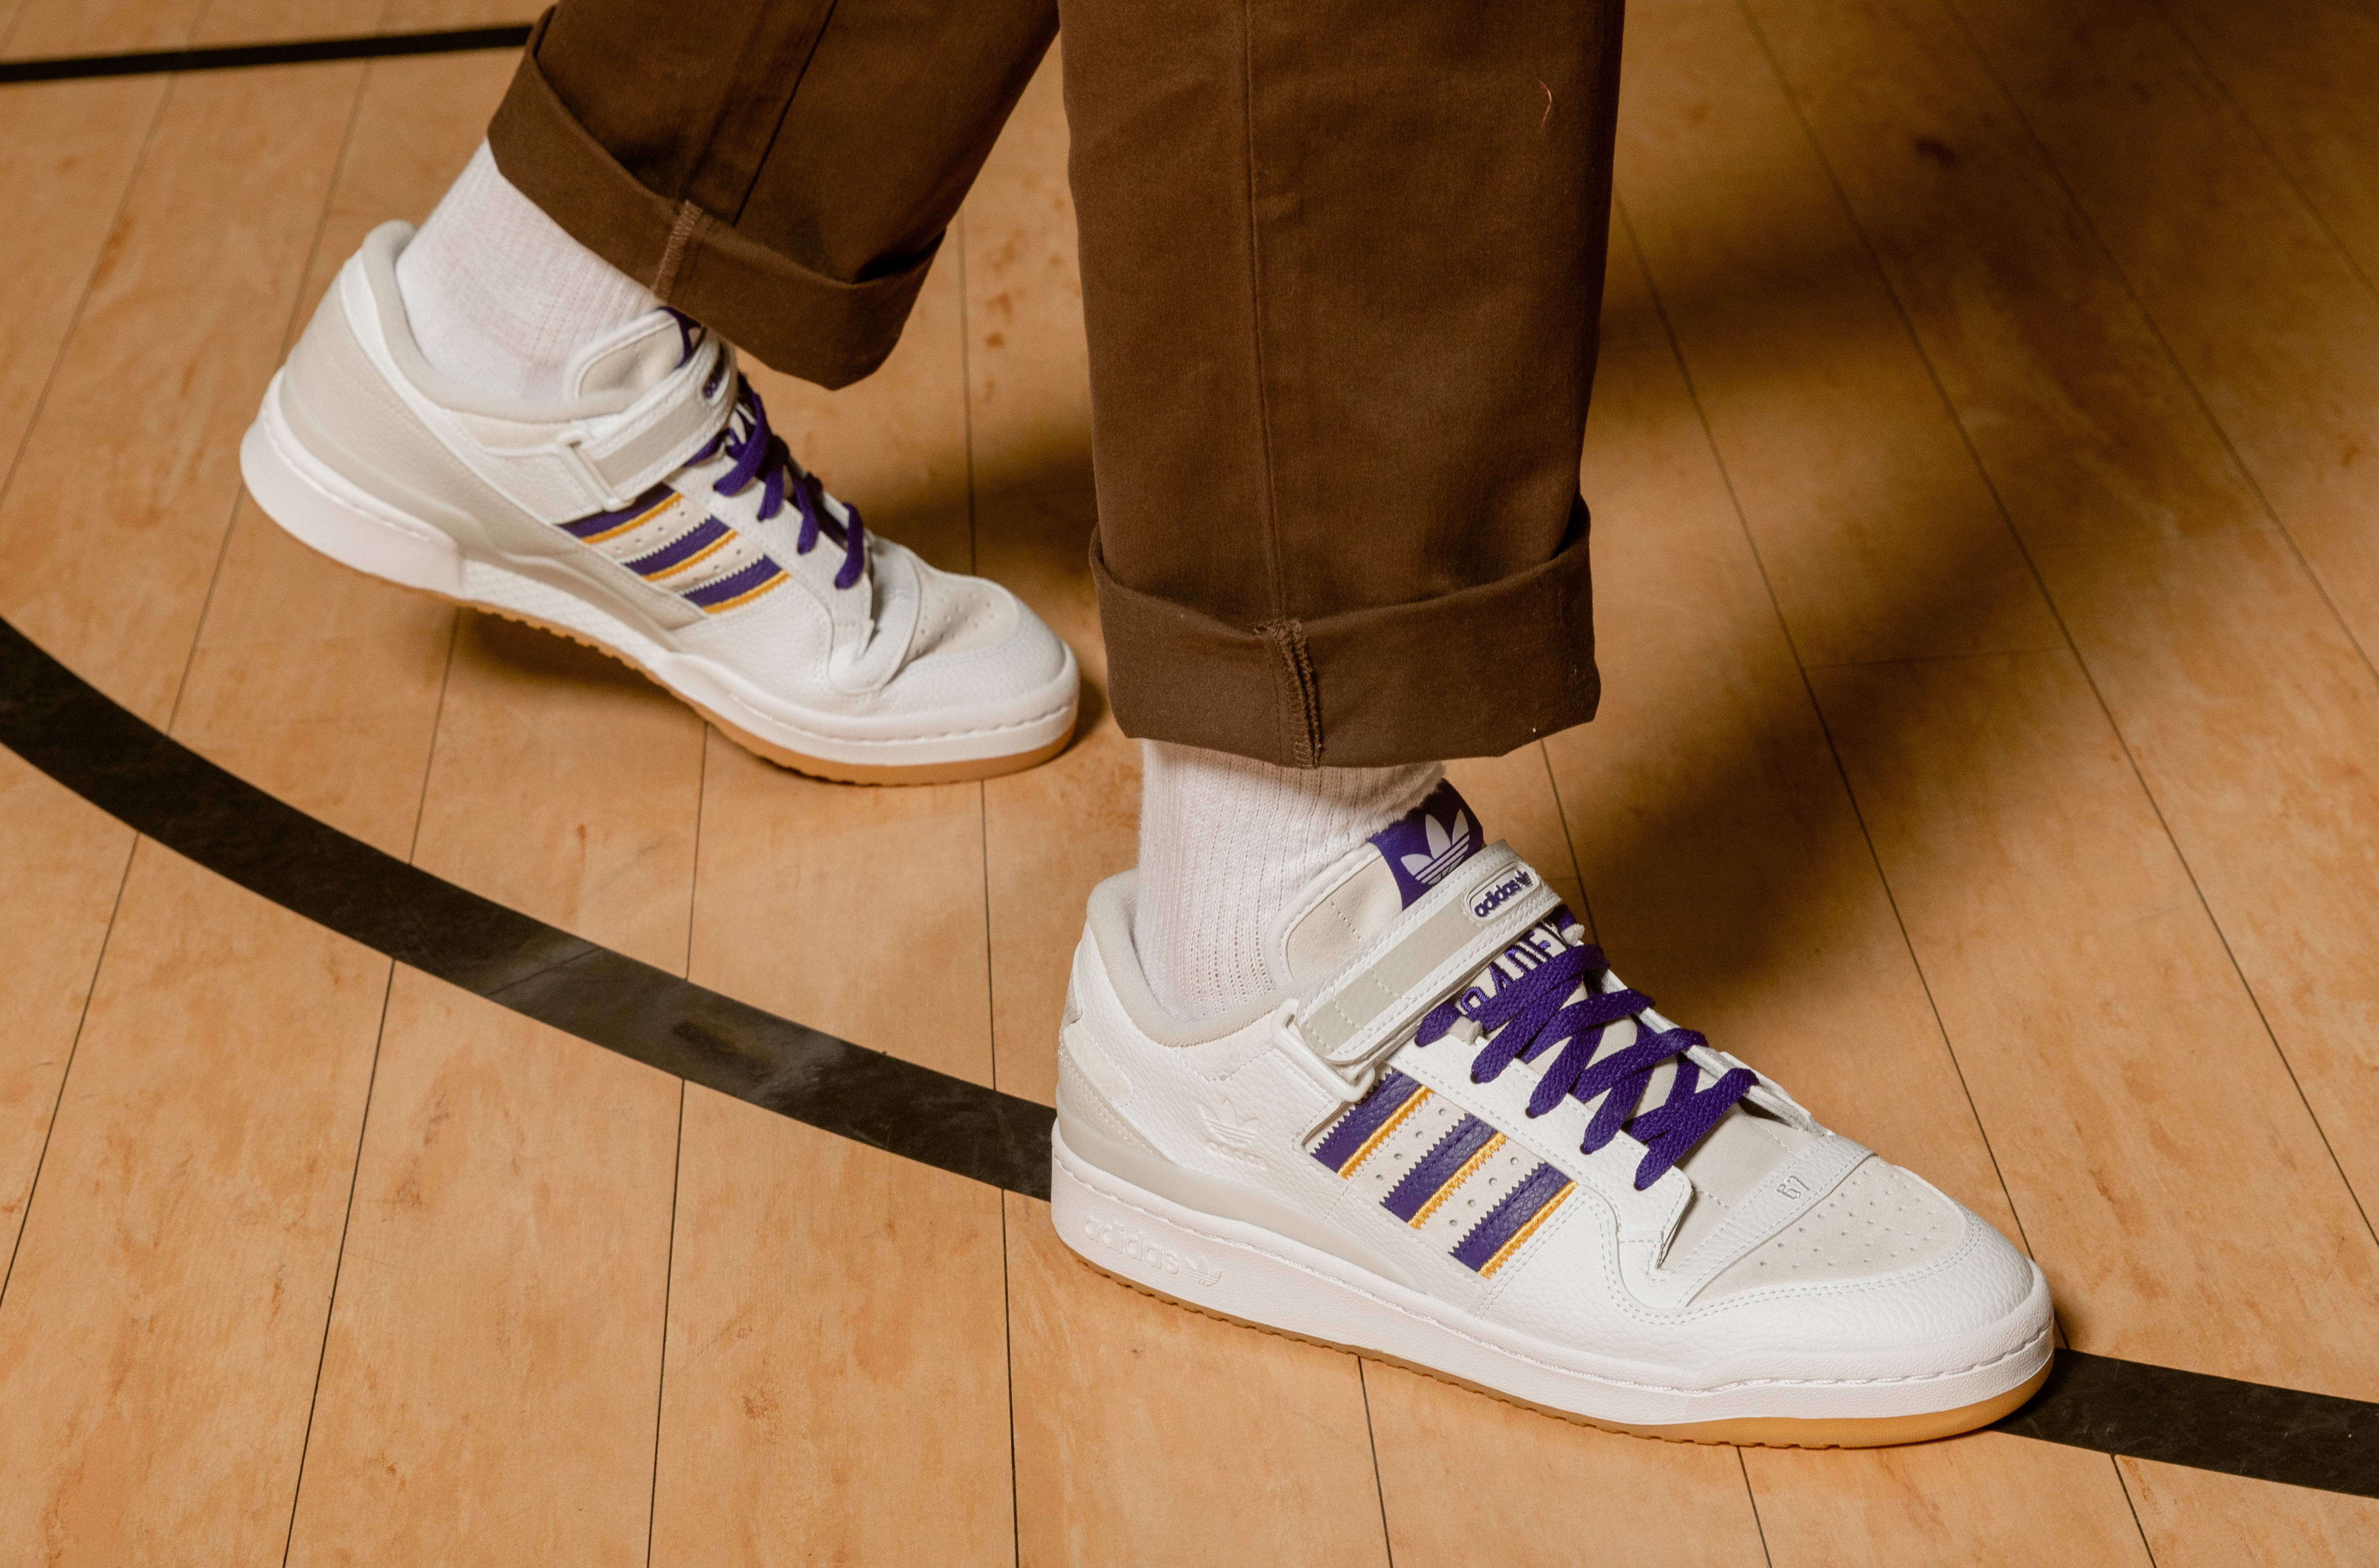 Shoe Palace x Adidas Forum Low (5)